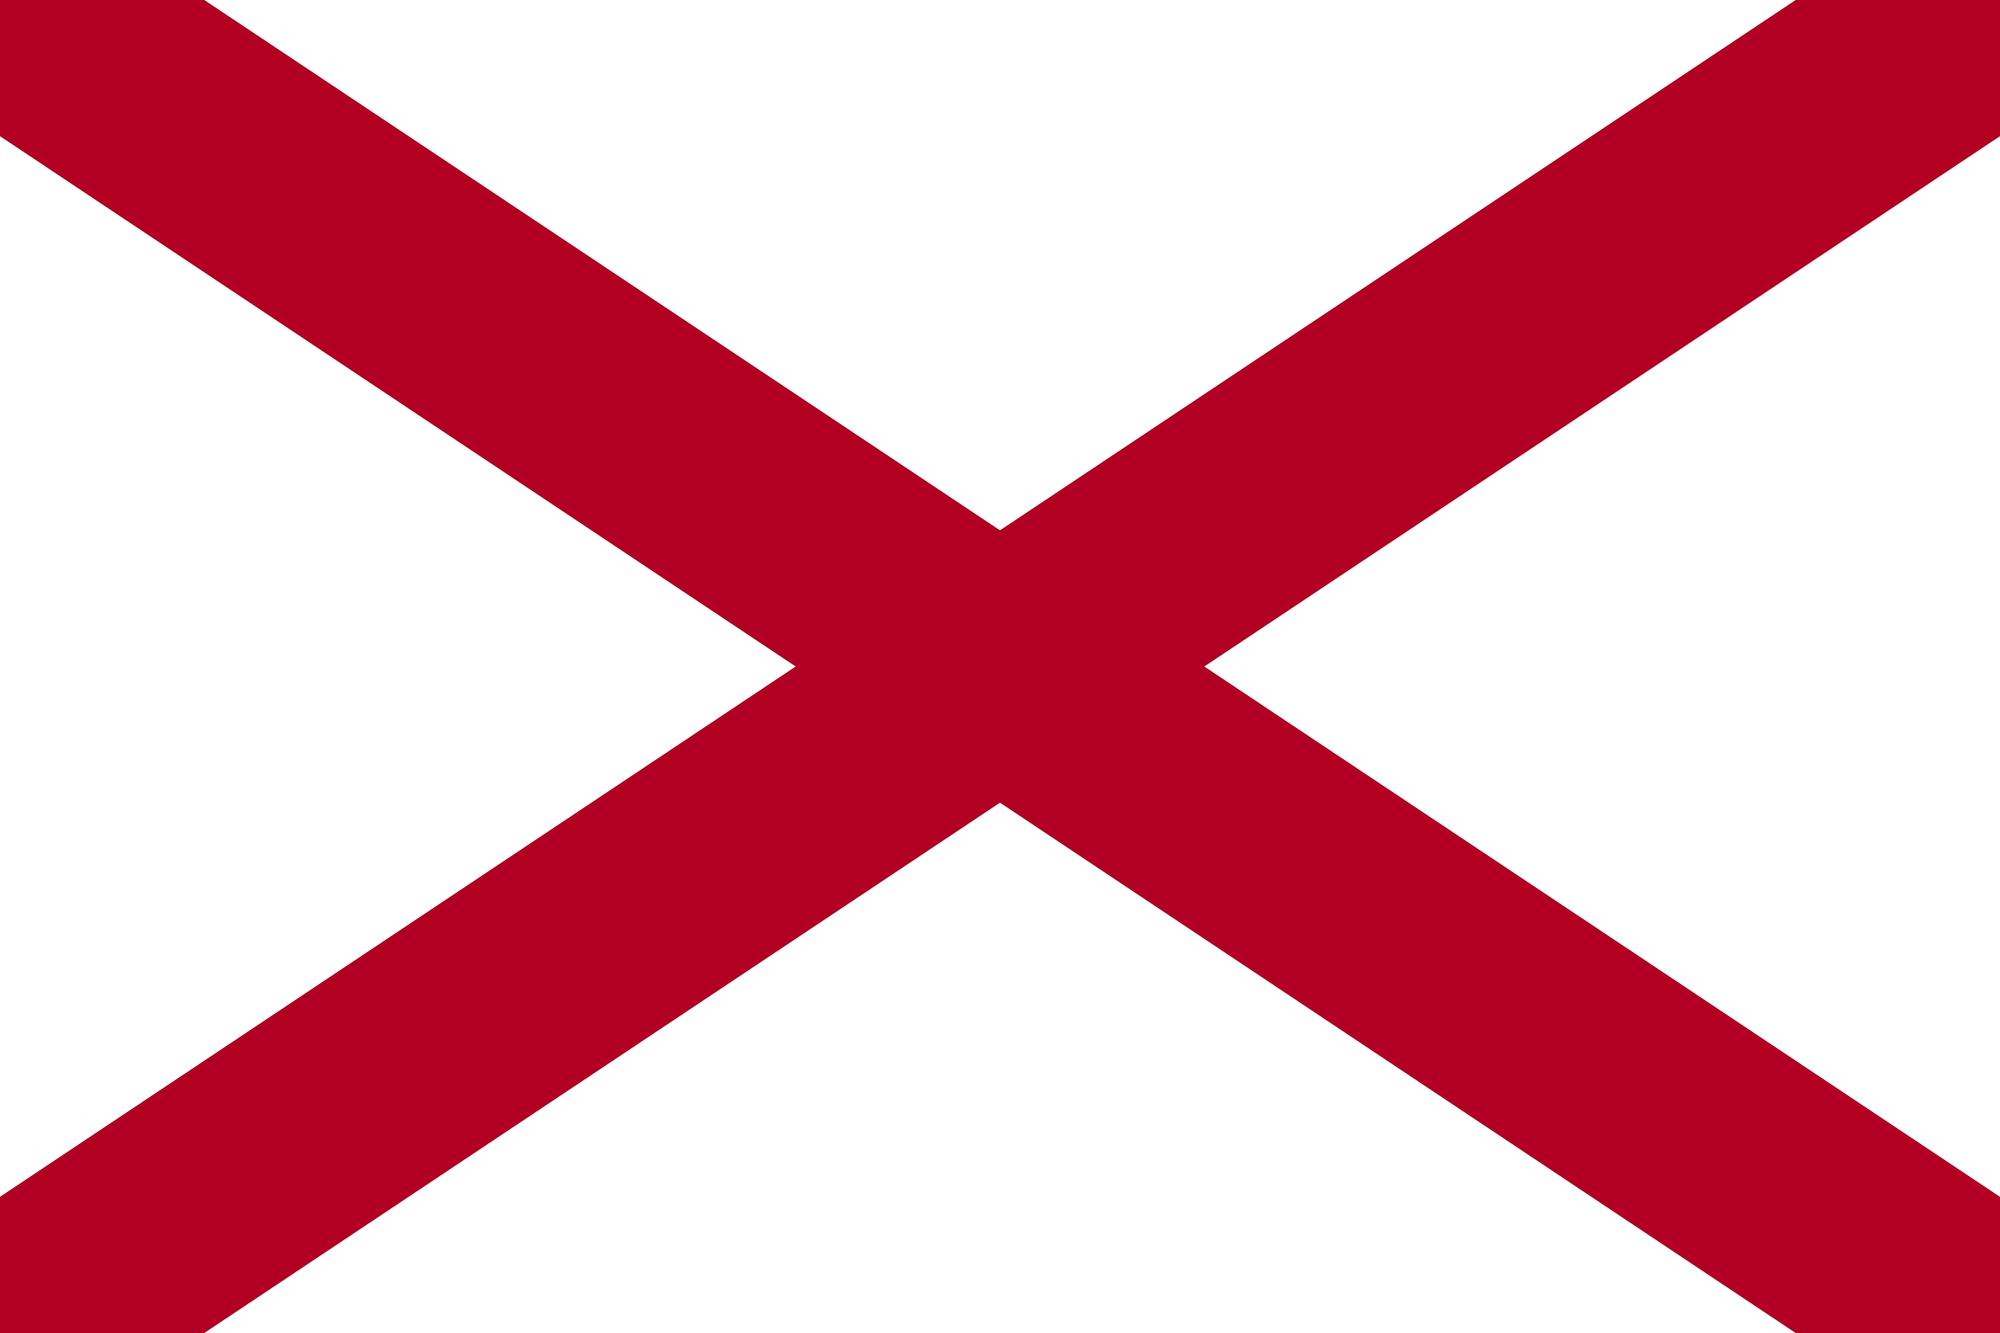 Image of png vexillology. Alabama clipart flag alabama